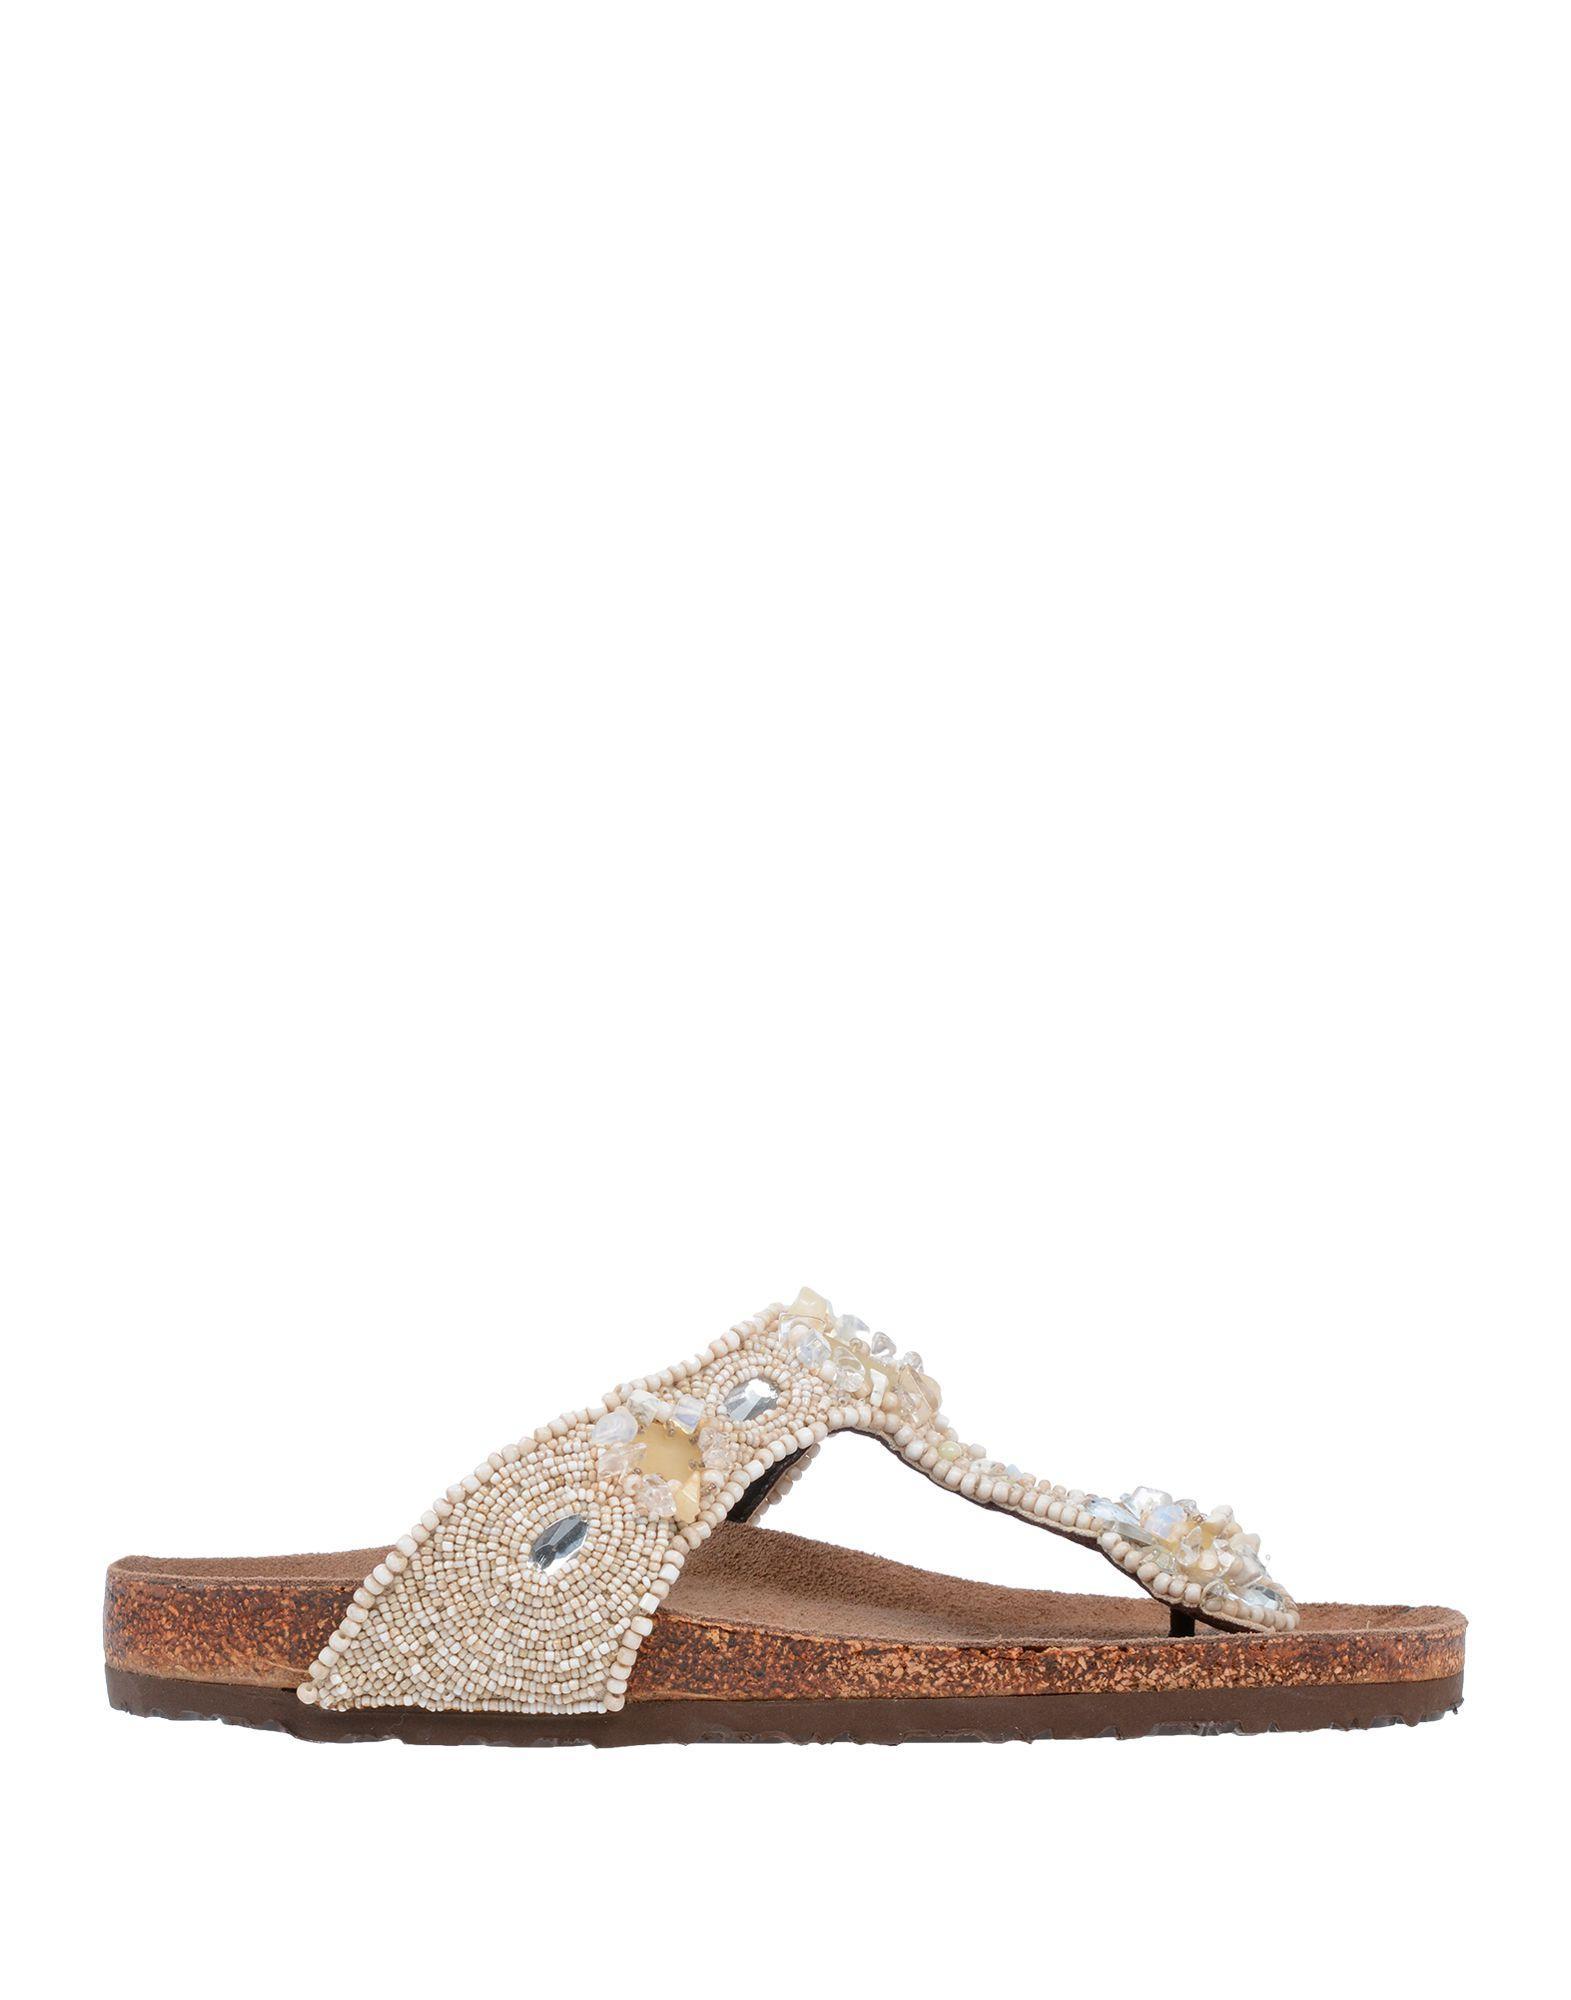 569bb59e2fe6 Lyst - Maliparmi Toe Post Sandal in White